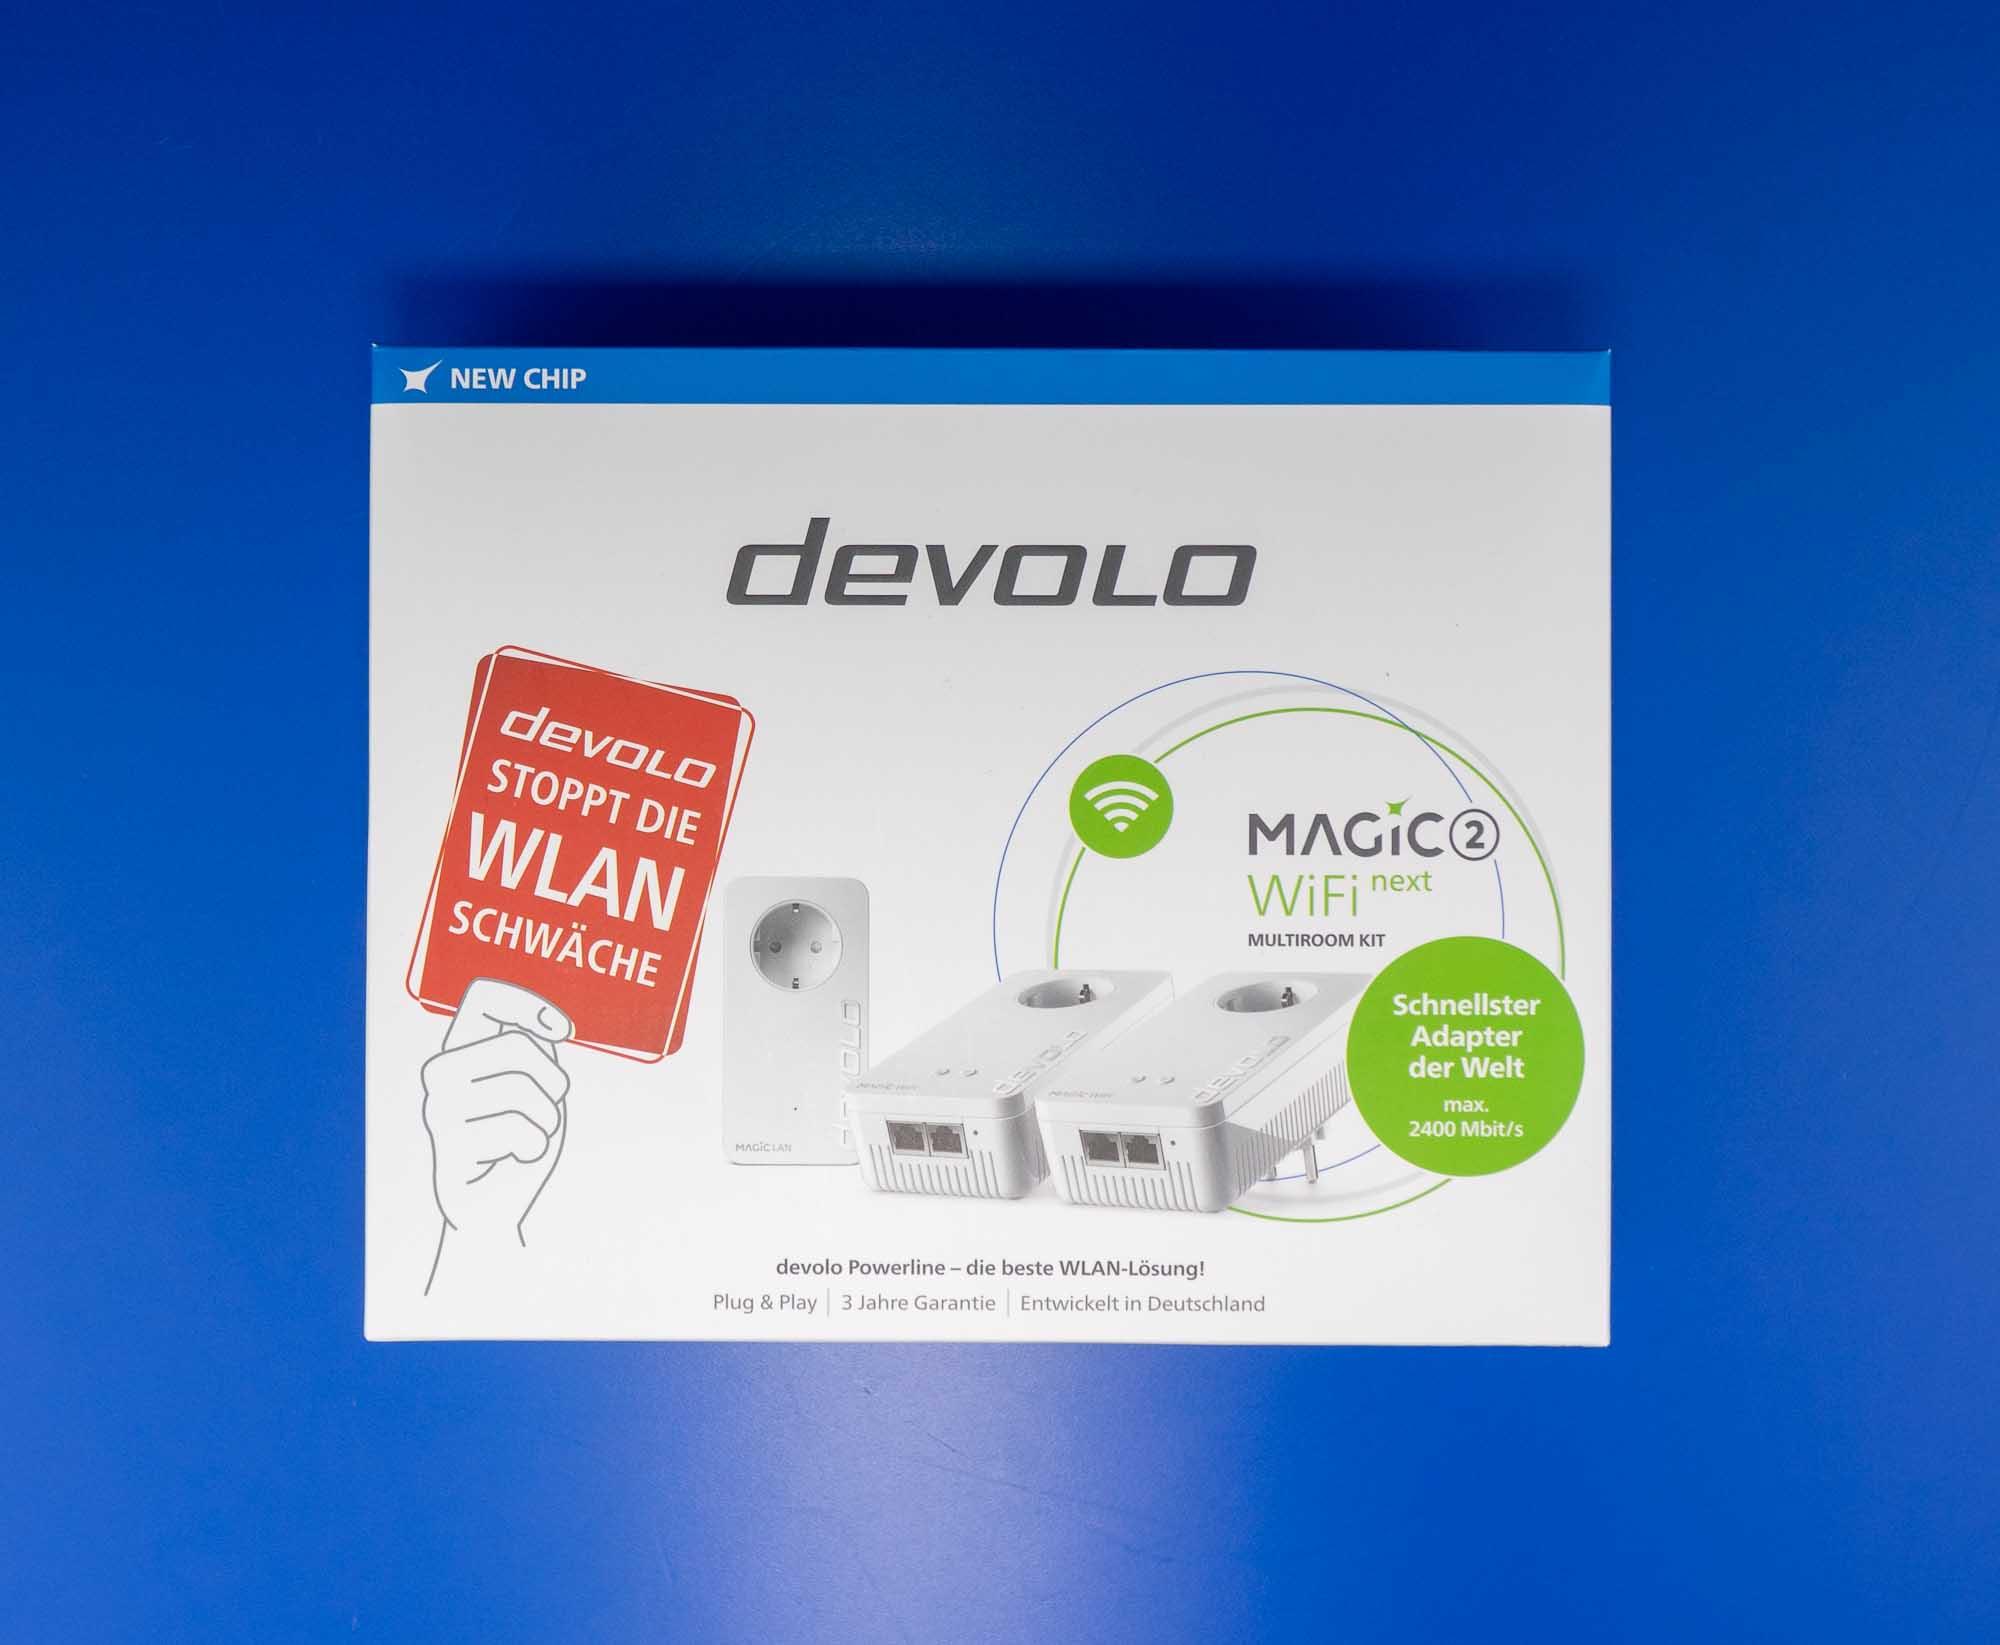 Verpackung devolo Magic 2 WiFi next Multiroom-Set